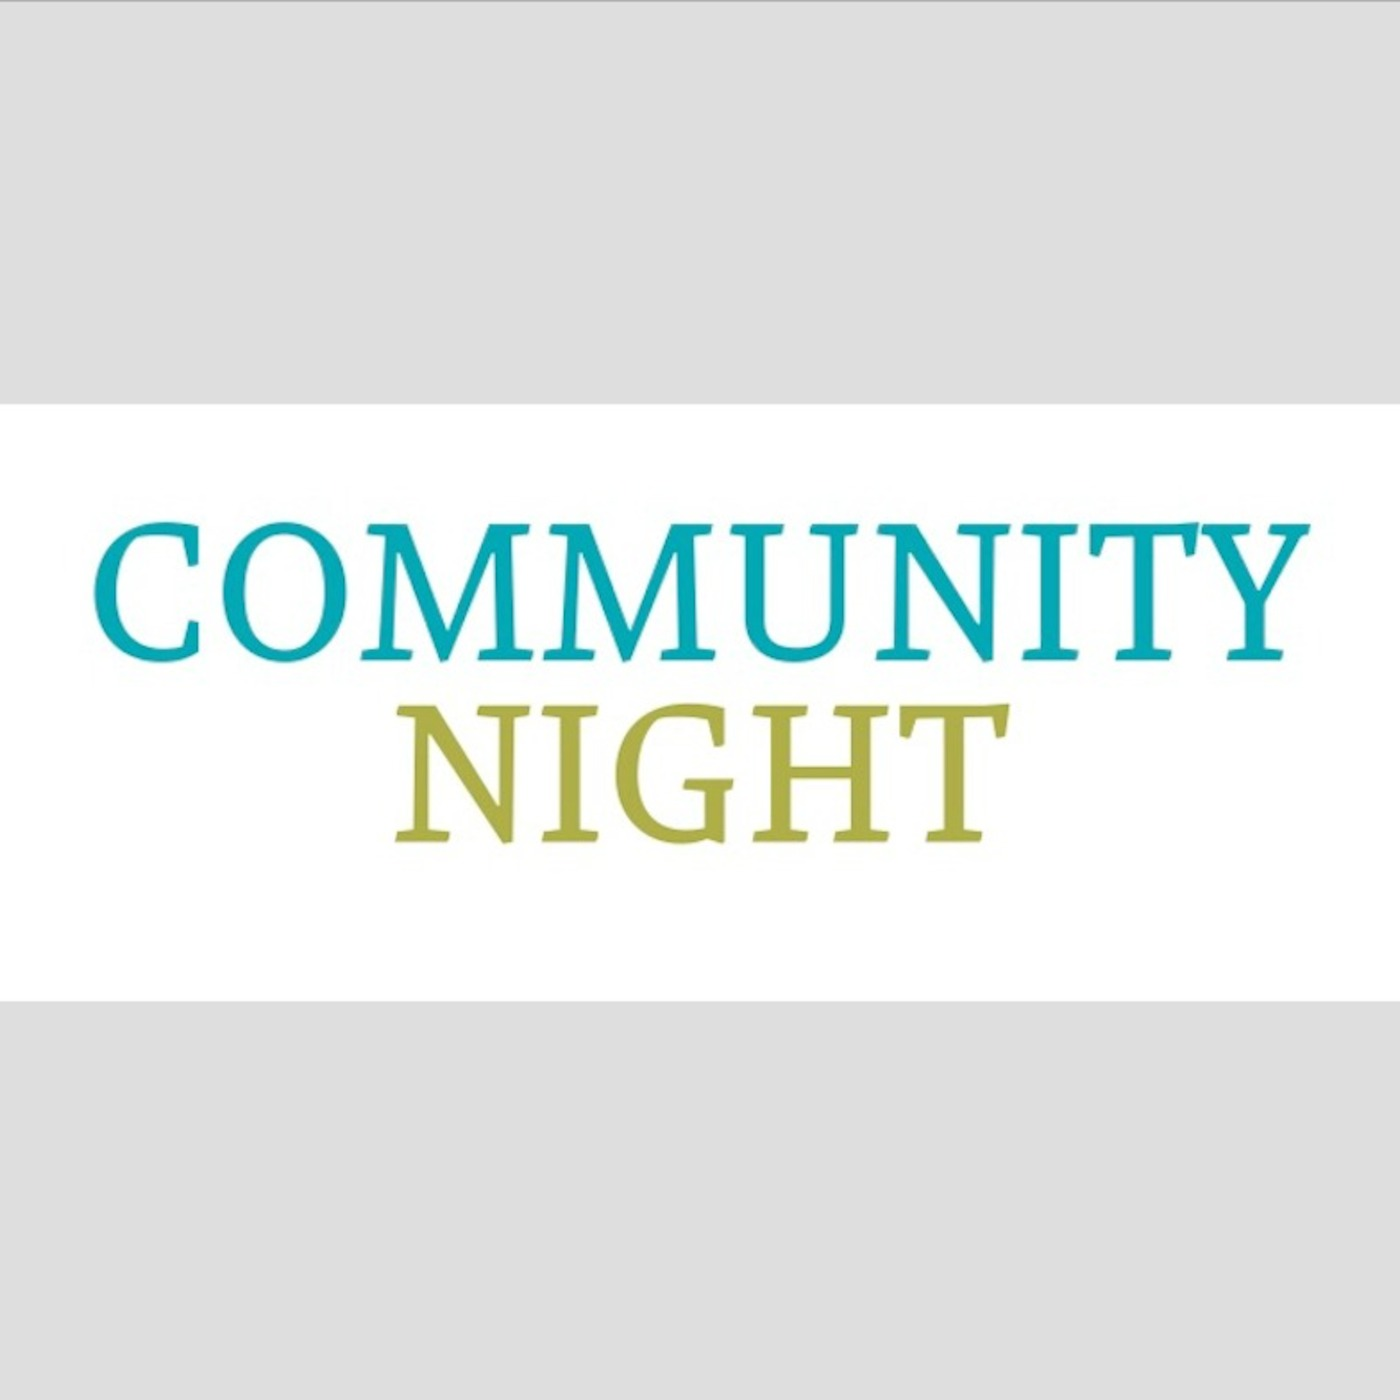 Community Night 2015